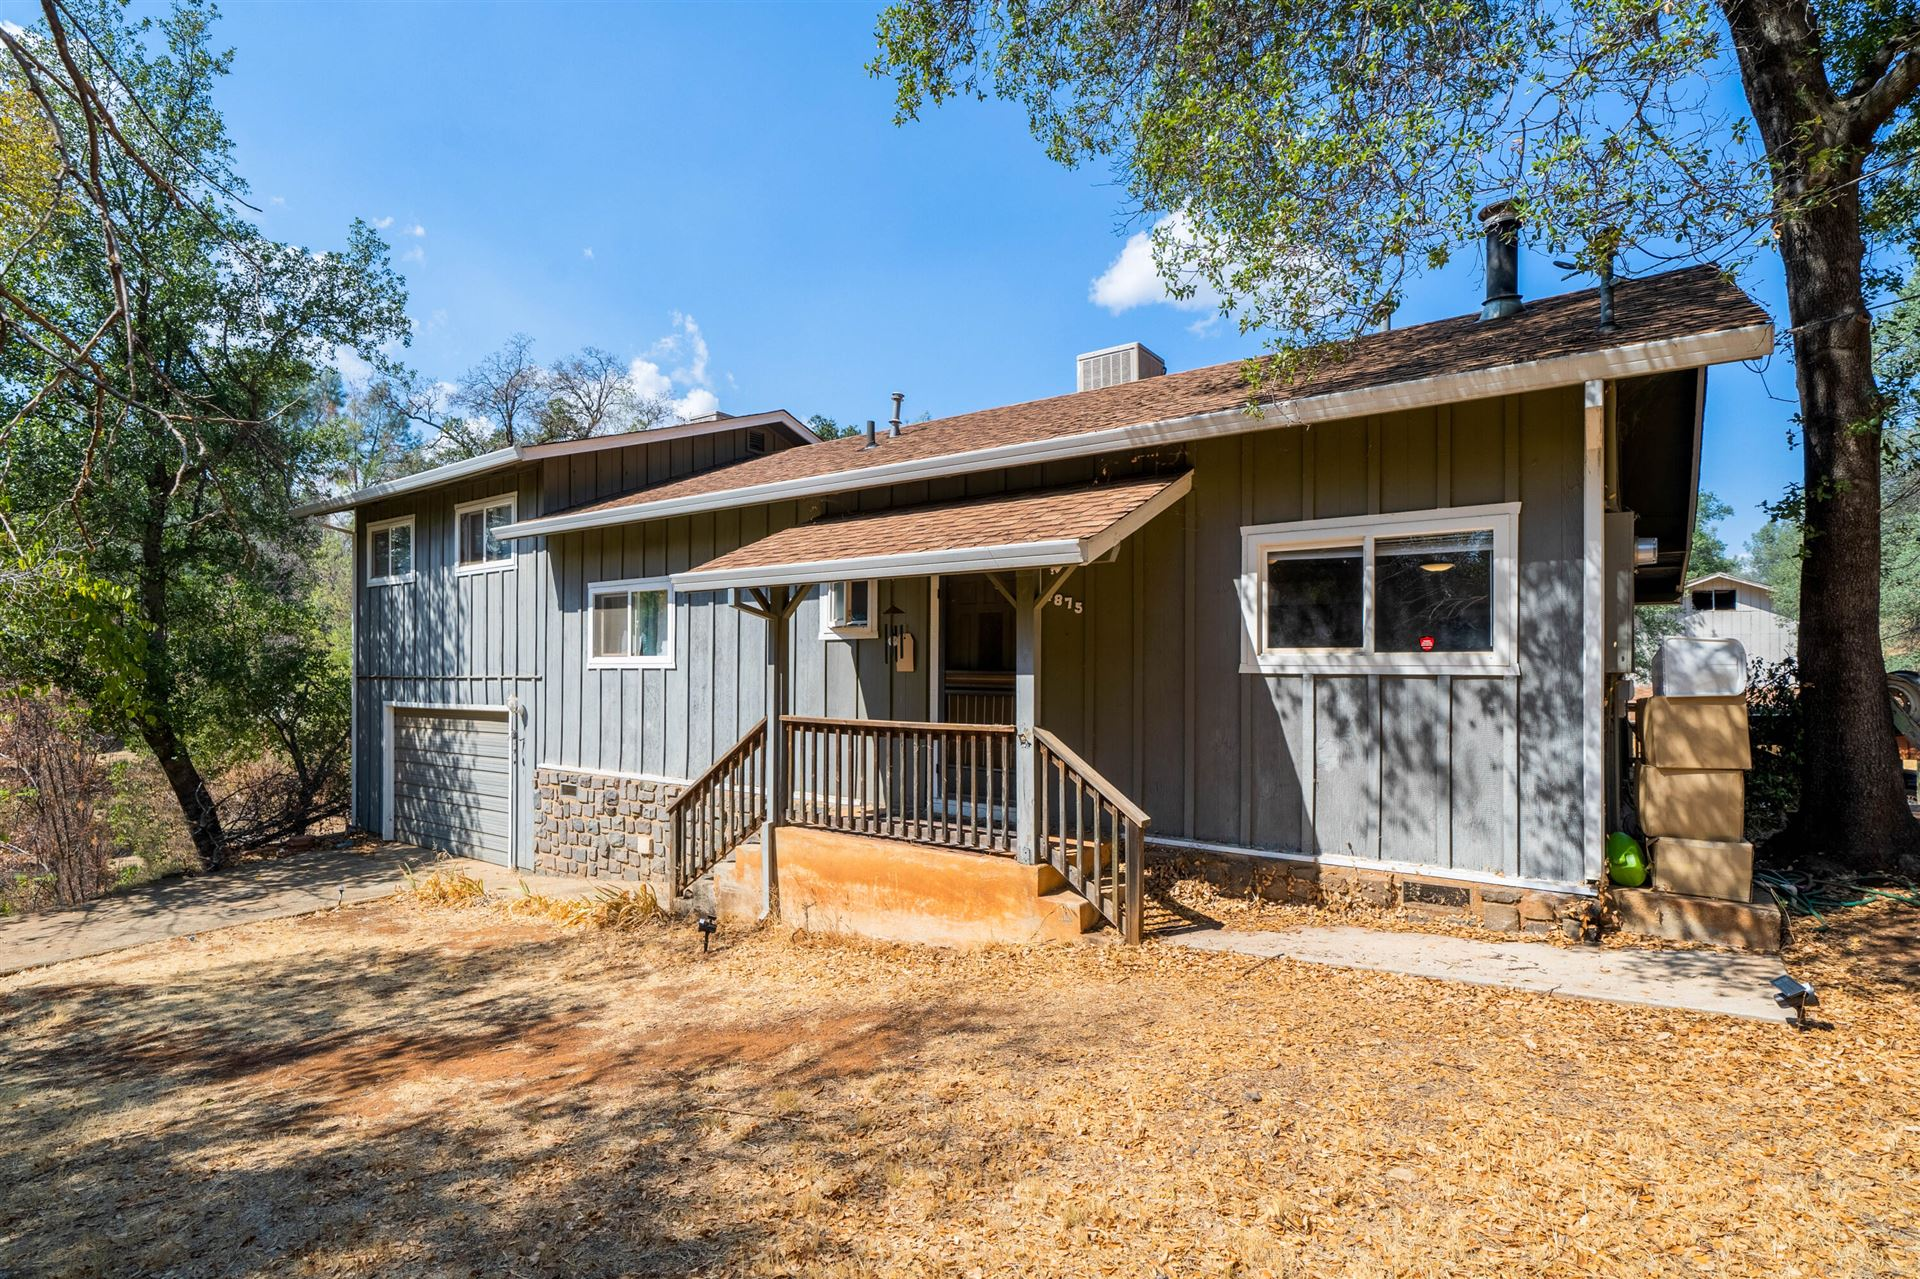 Photo of 4875 Williamette St, Shasta Lake, CA 96019 (MLS # 21-4370)